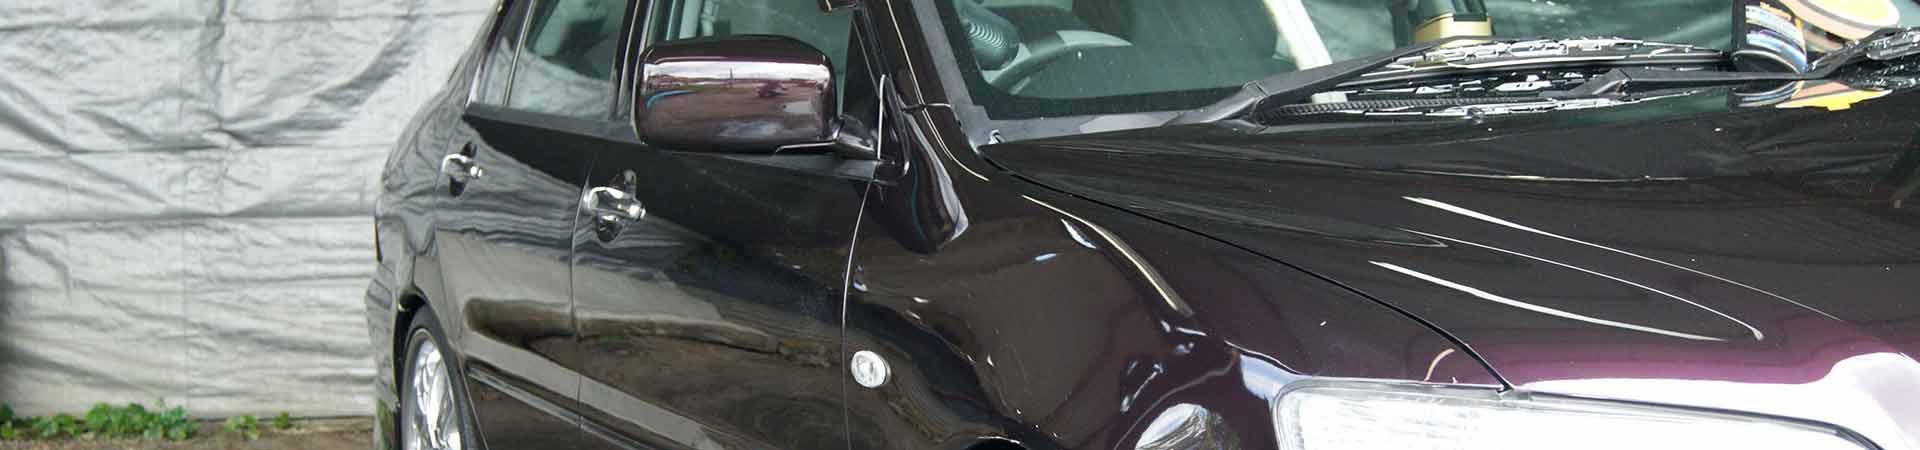 Sedan Car Wash Service